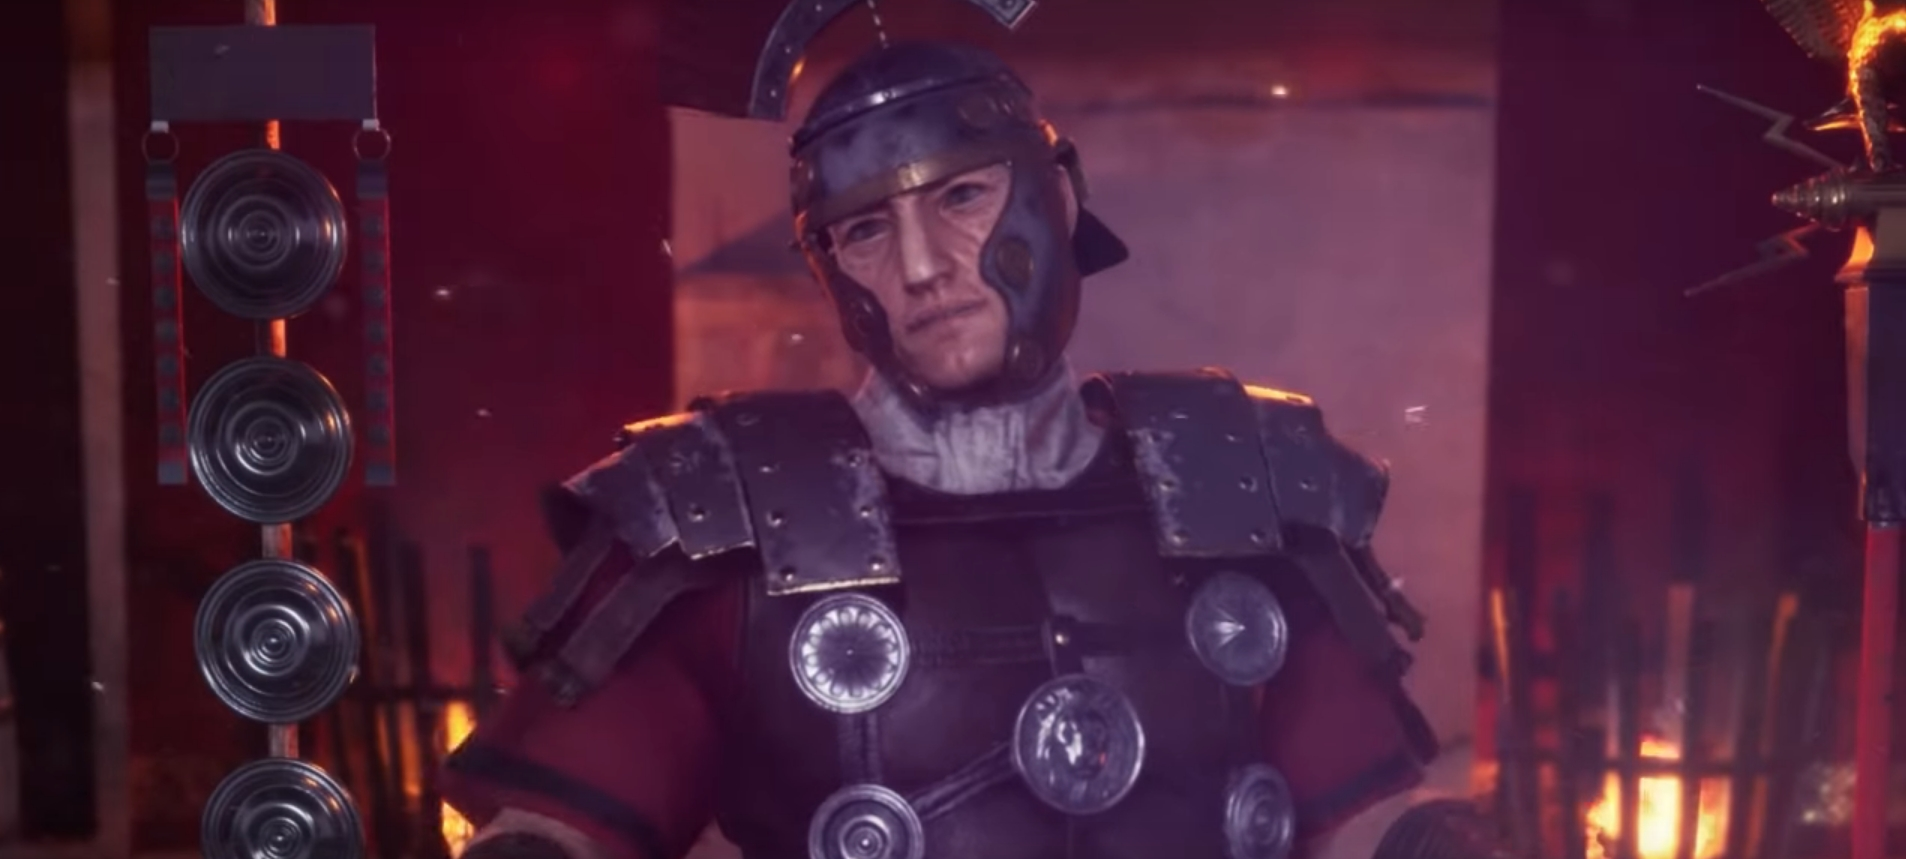 Gladiux Teaser Trailer Showcases Gladiator Battles In Ancient Rome